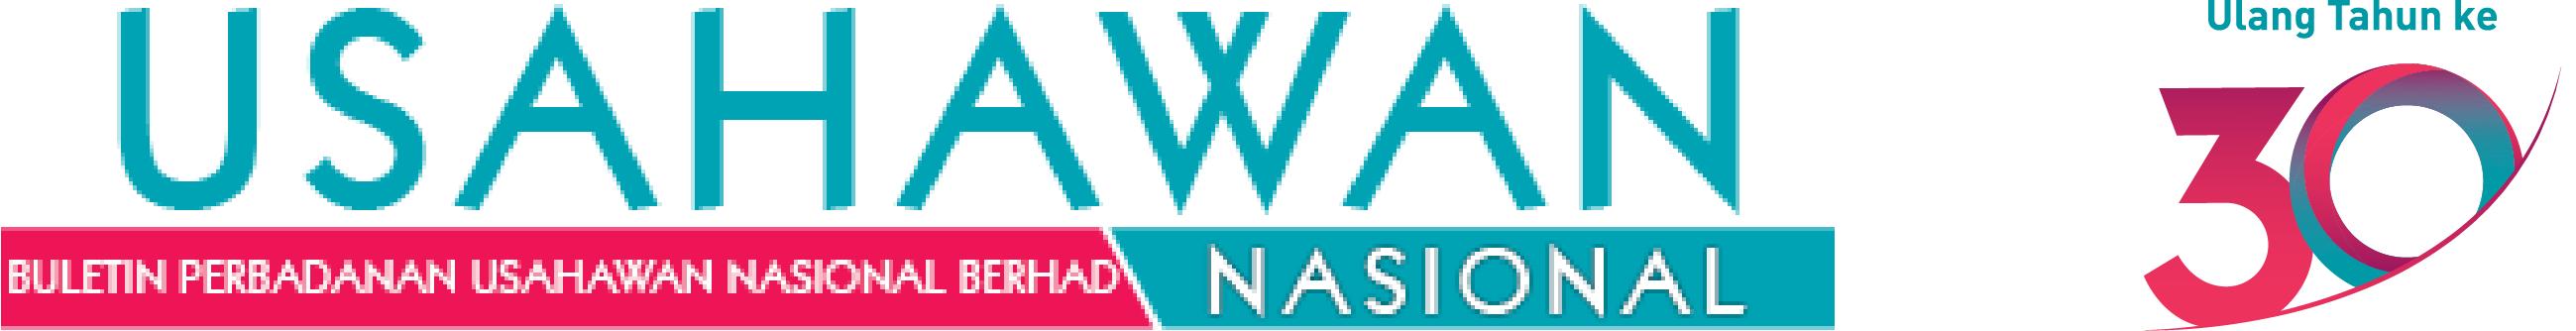 Usahawan Nasional Webzine